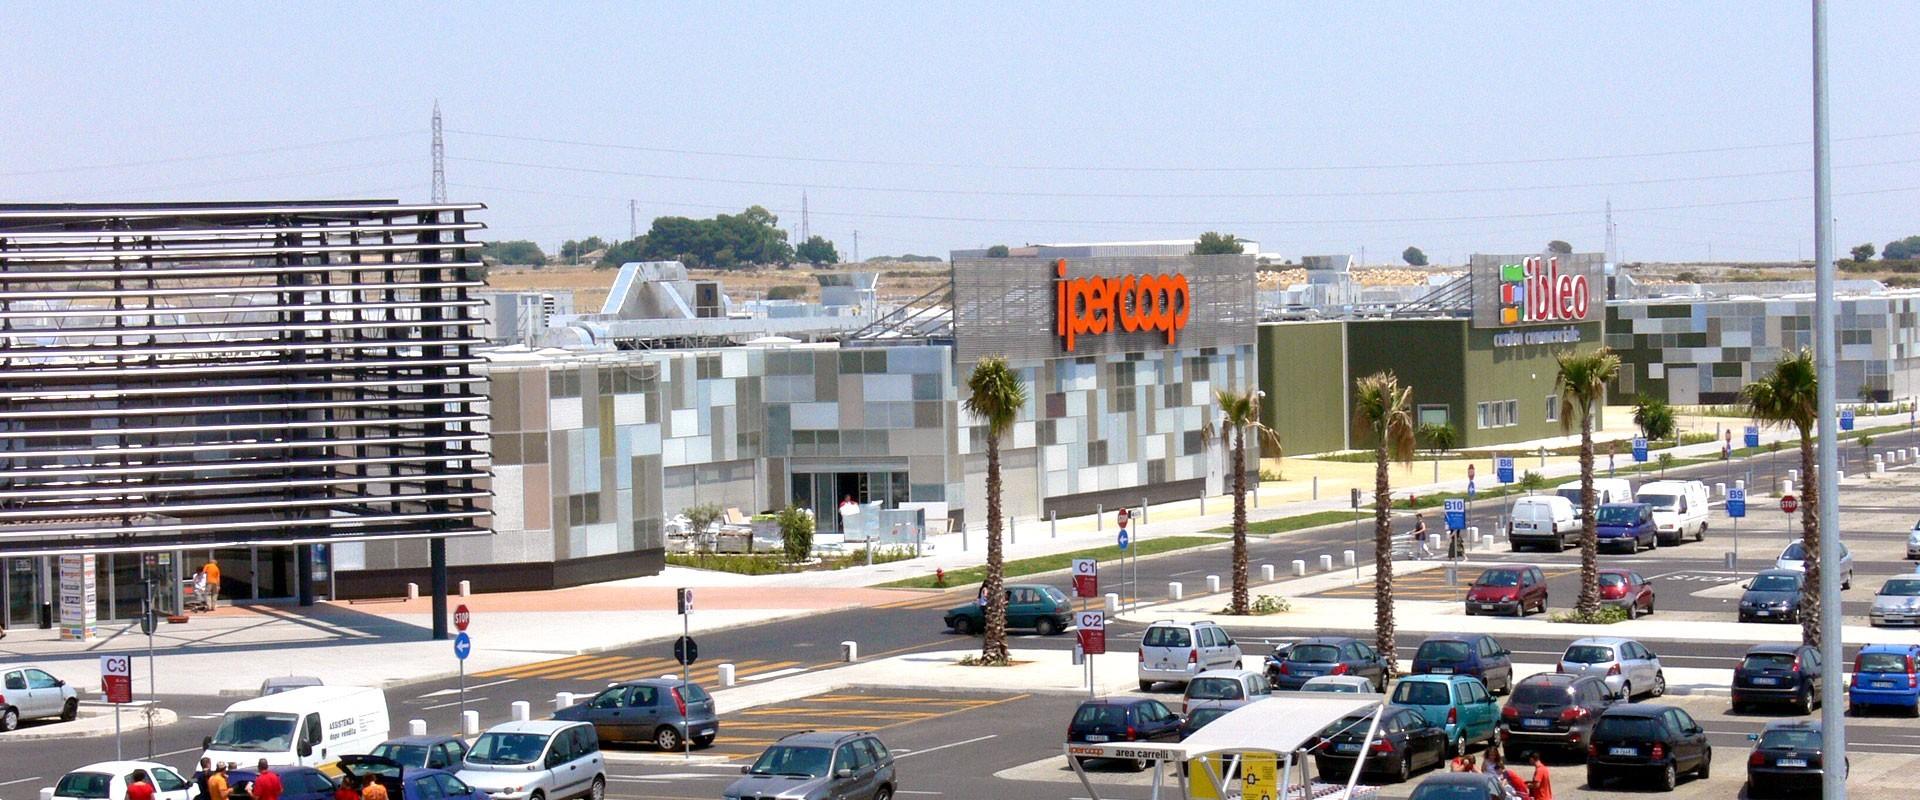 ipercoop taranto negozi galleria mall - photo#14